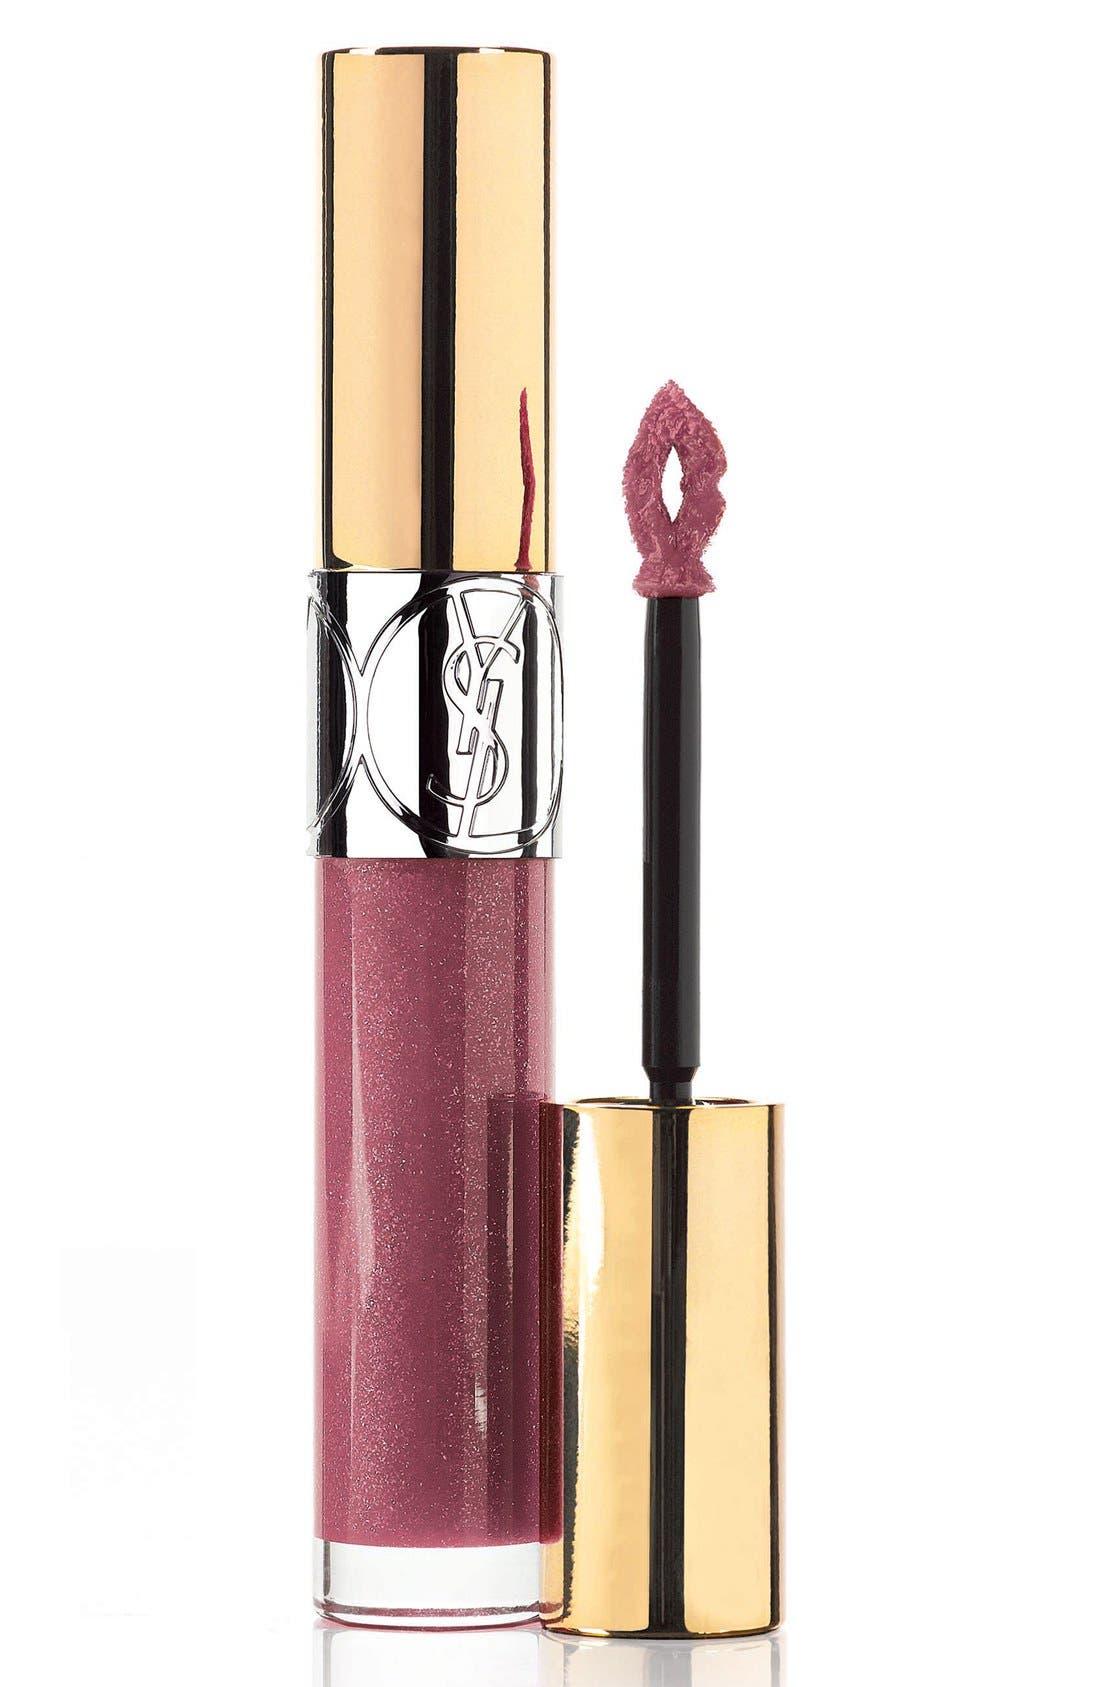 Yves Saint Laurent 'Savage Summer - Gloss Volupte' Lip Gloss